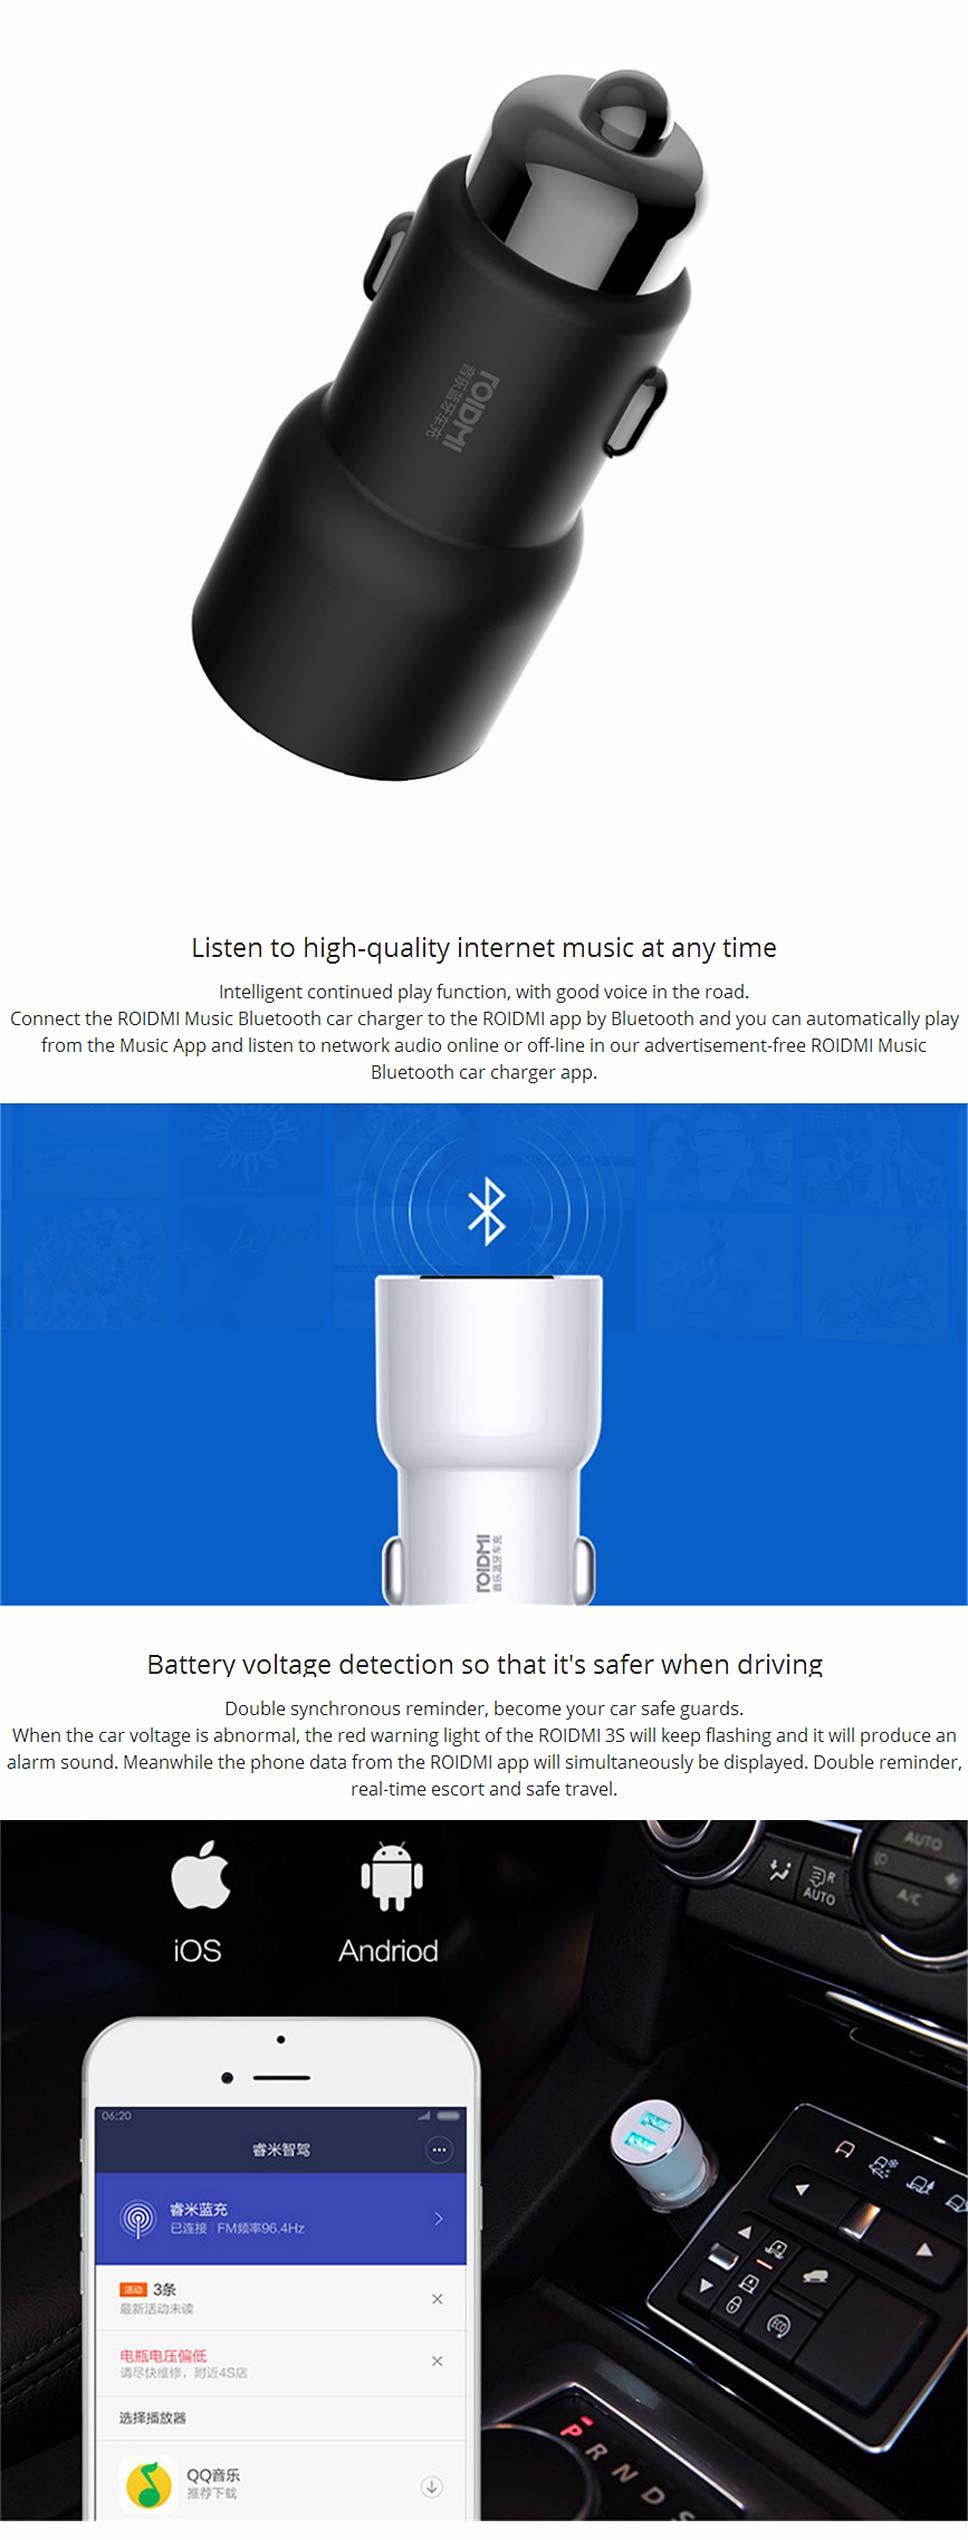 Details about Xiaomi ROIDMI 3S Bluetooth Music Player FM Transmitter 5V  3 4A Dual USB Car Kit